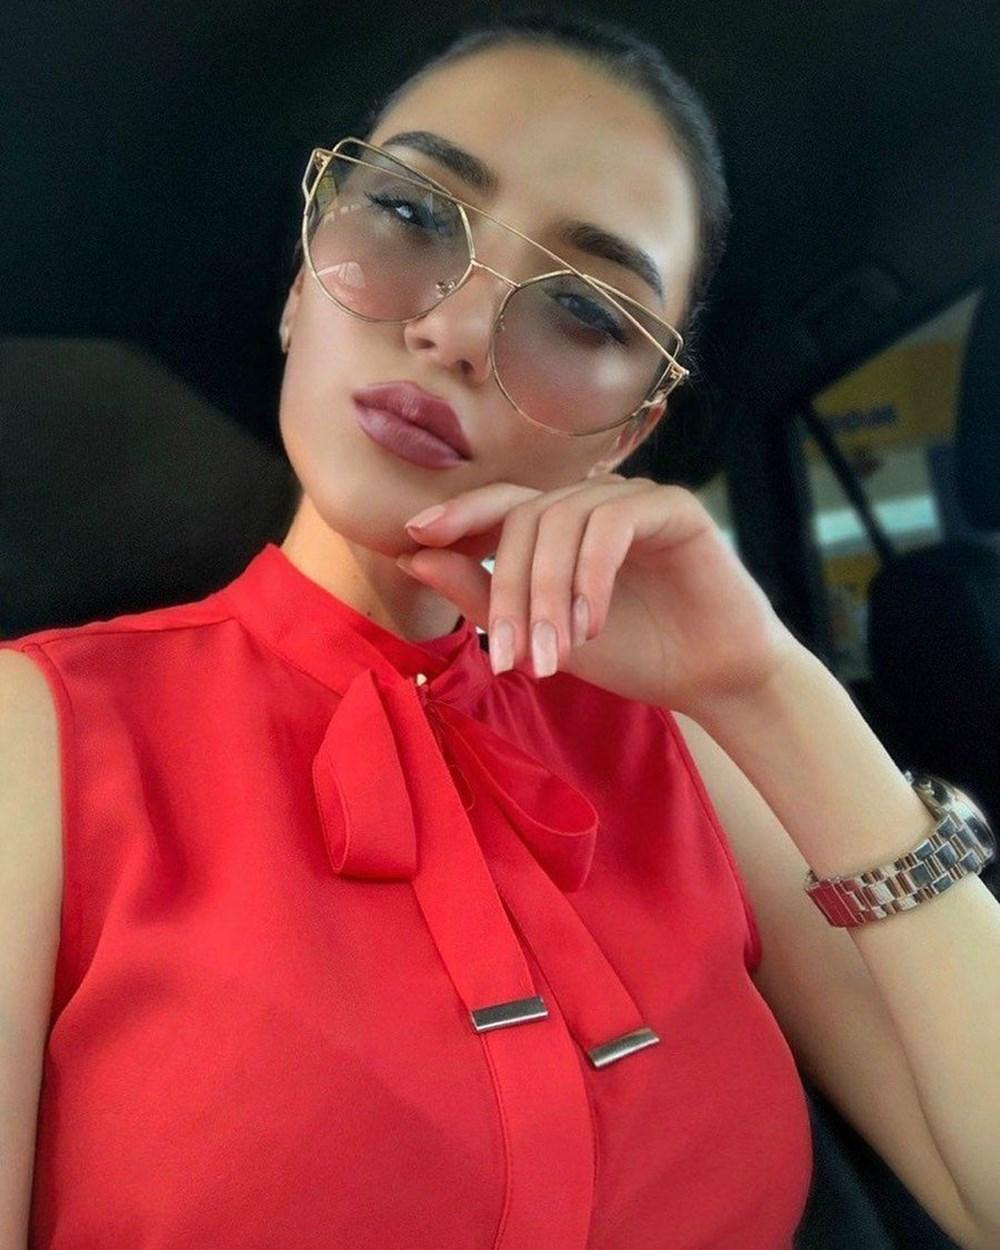 Fenomen Anna Leikovic annesini öldürdü - 4